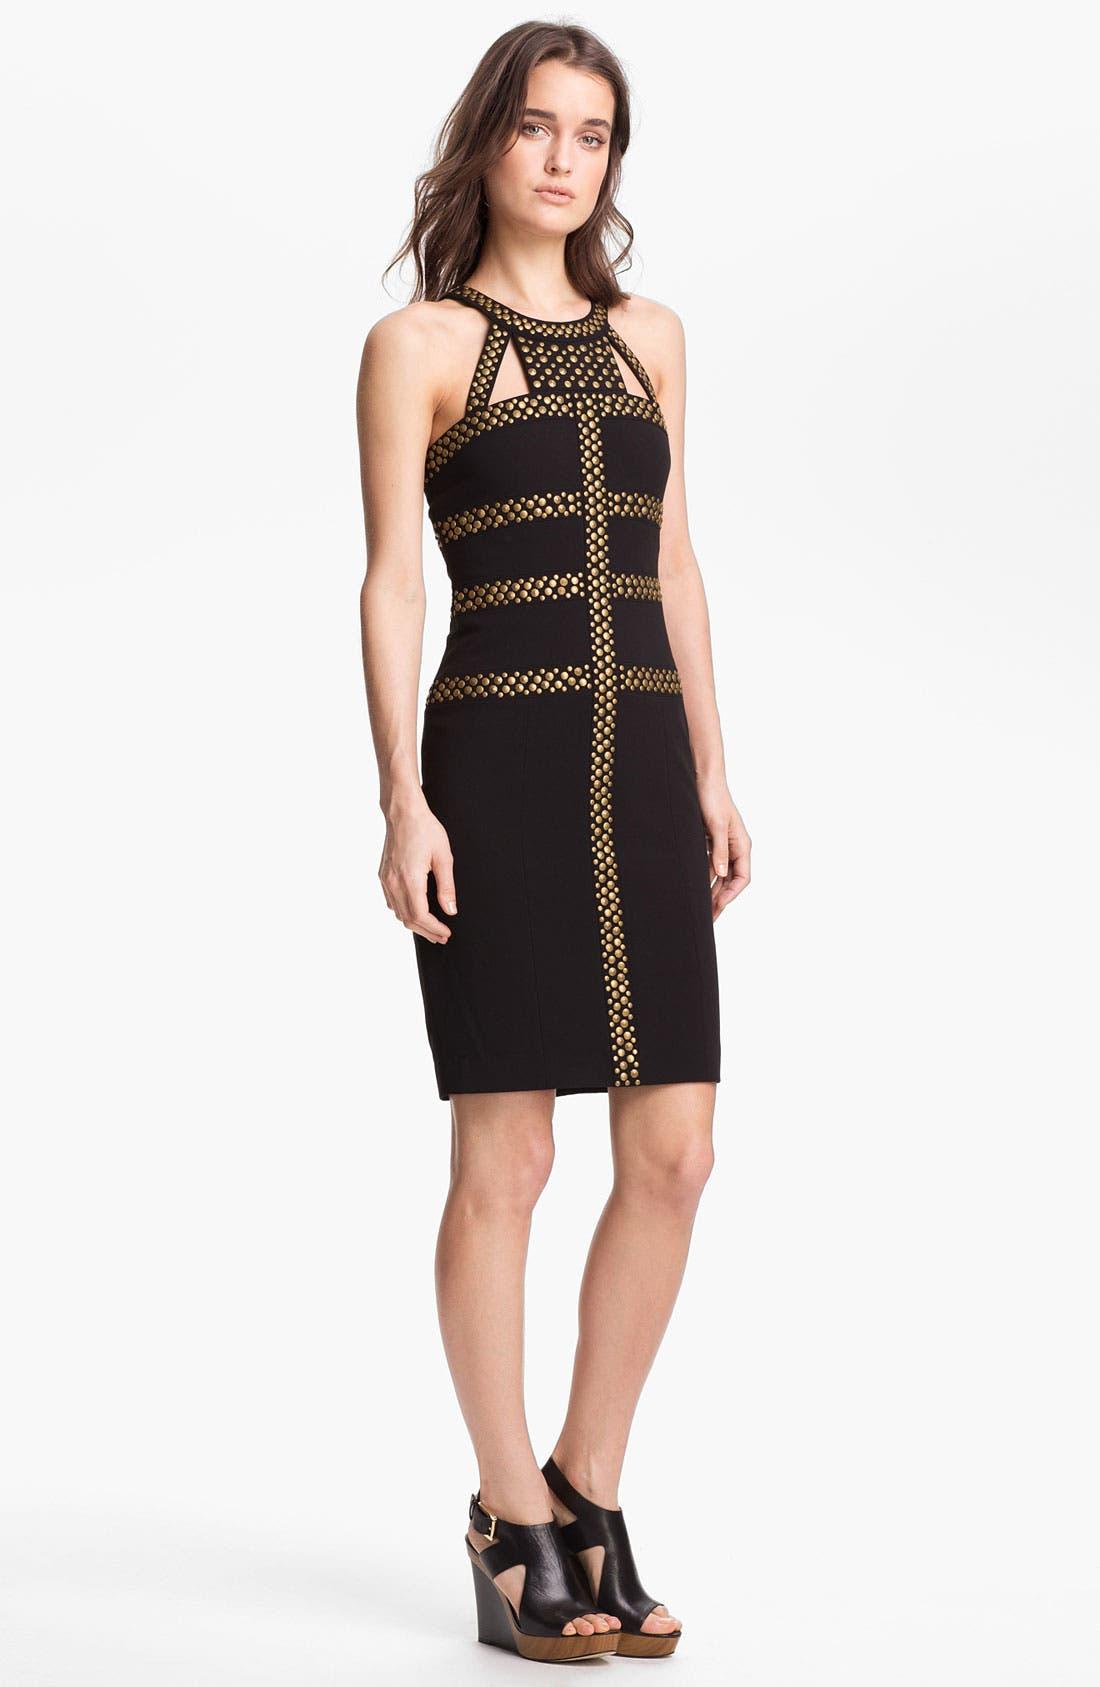 Alternate Image 1 Selected - BCBGMAXAZRIA Studded Sheath Dress